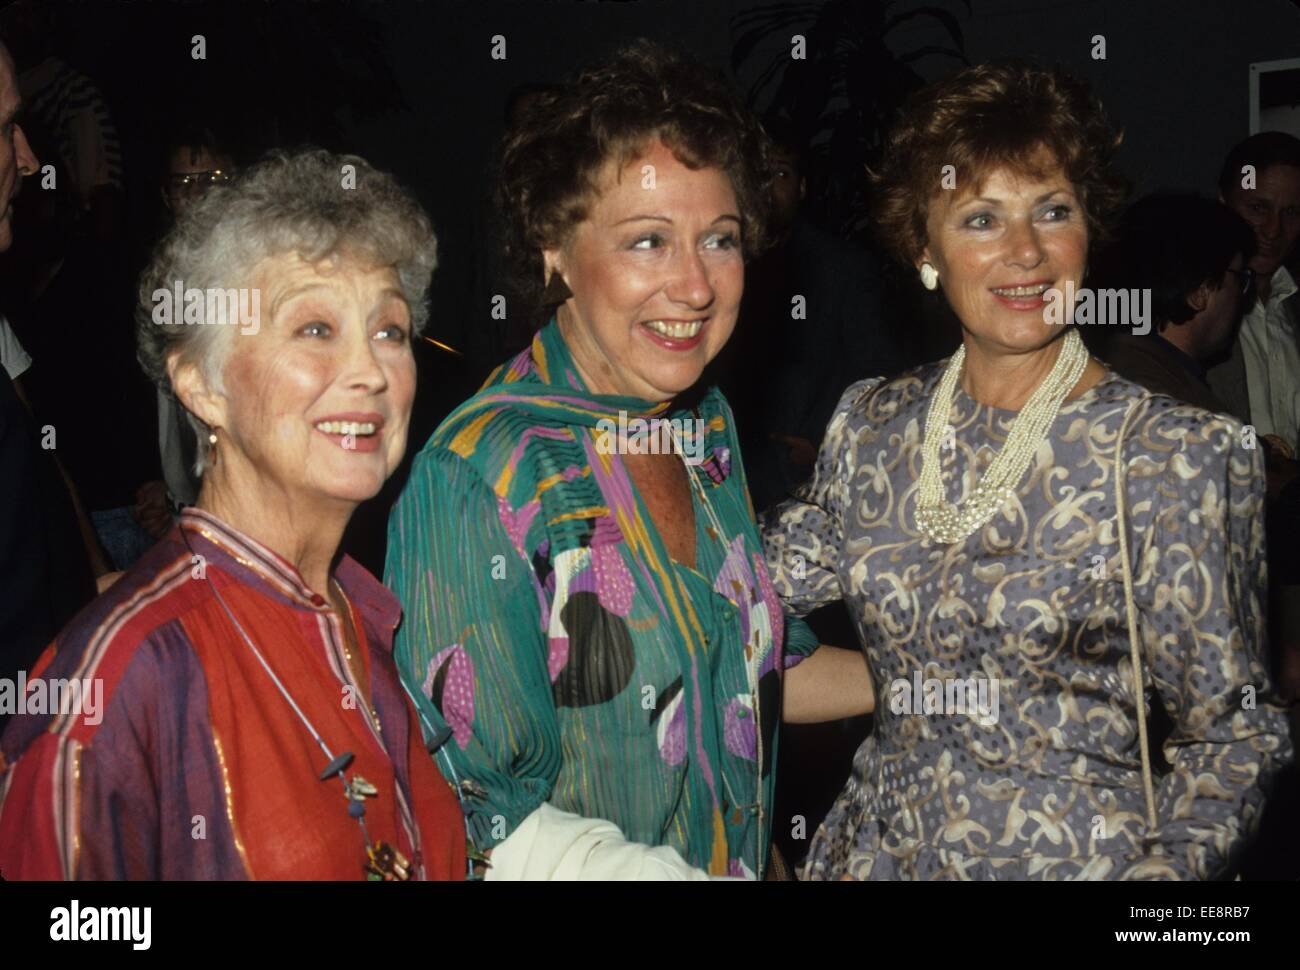 Kirsty Hume GBR,Kelly Mittendorf Erotic nude Gail Russell,Zeryl Lim (b. 1987)